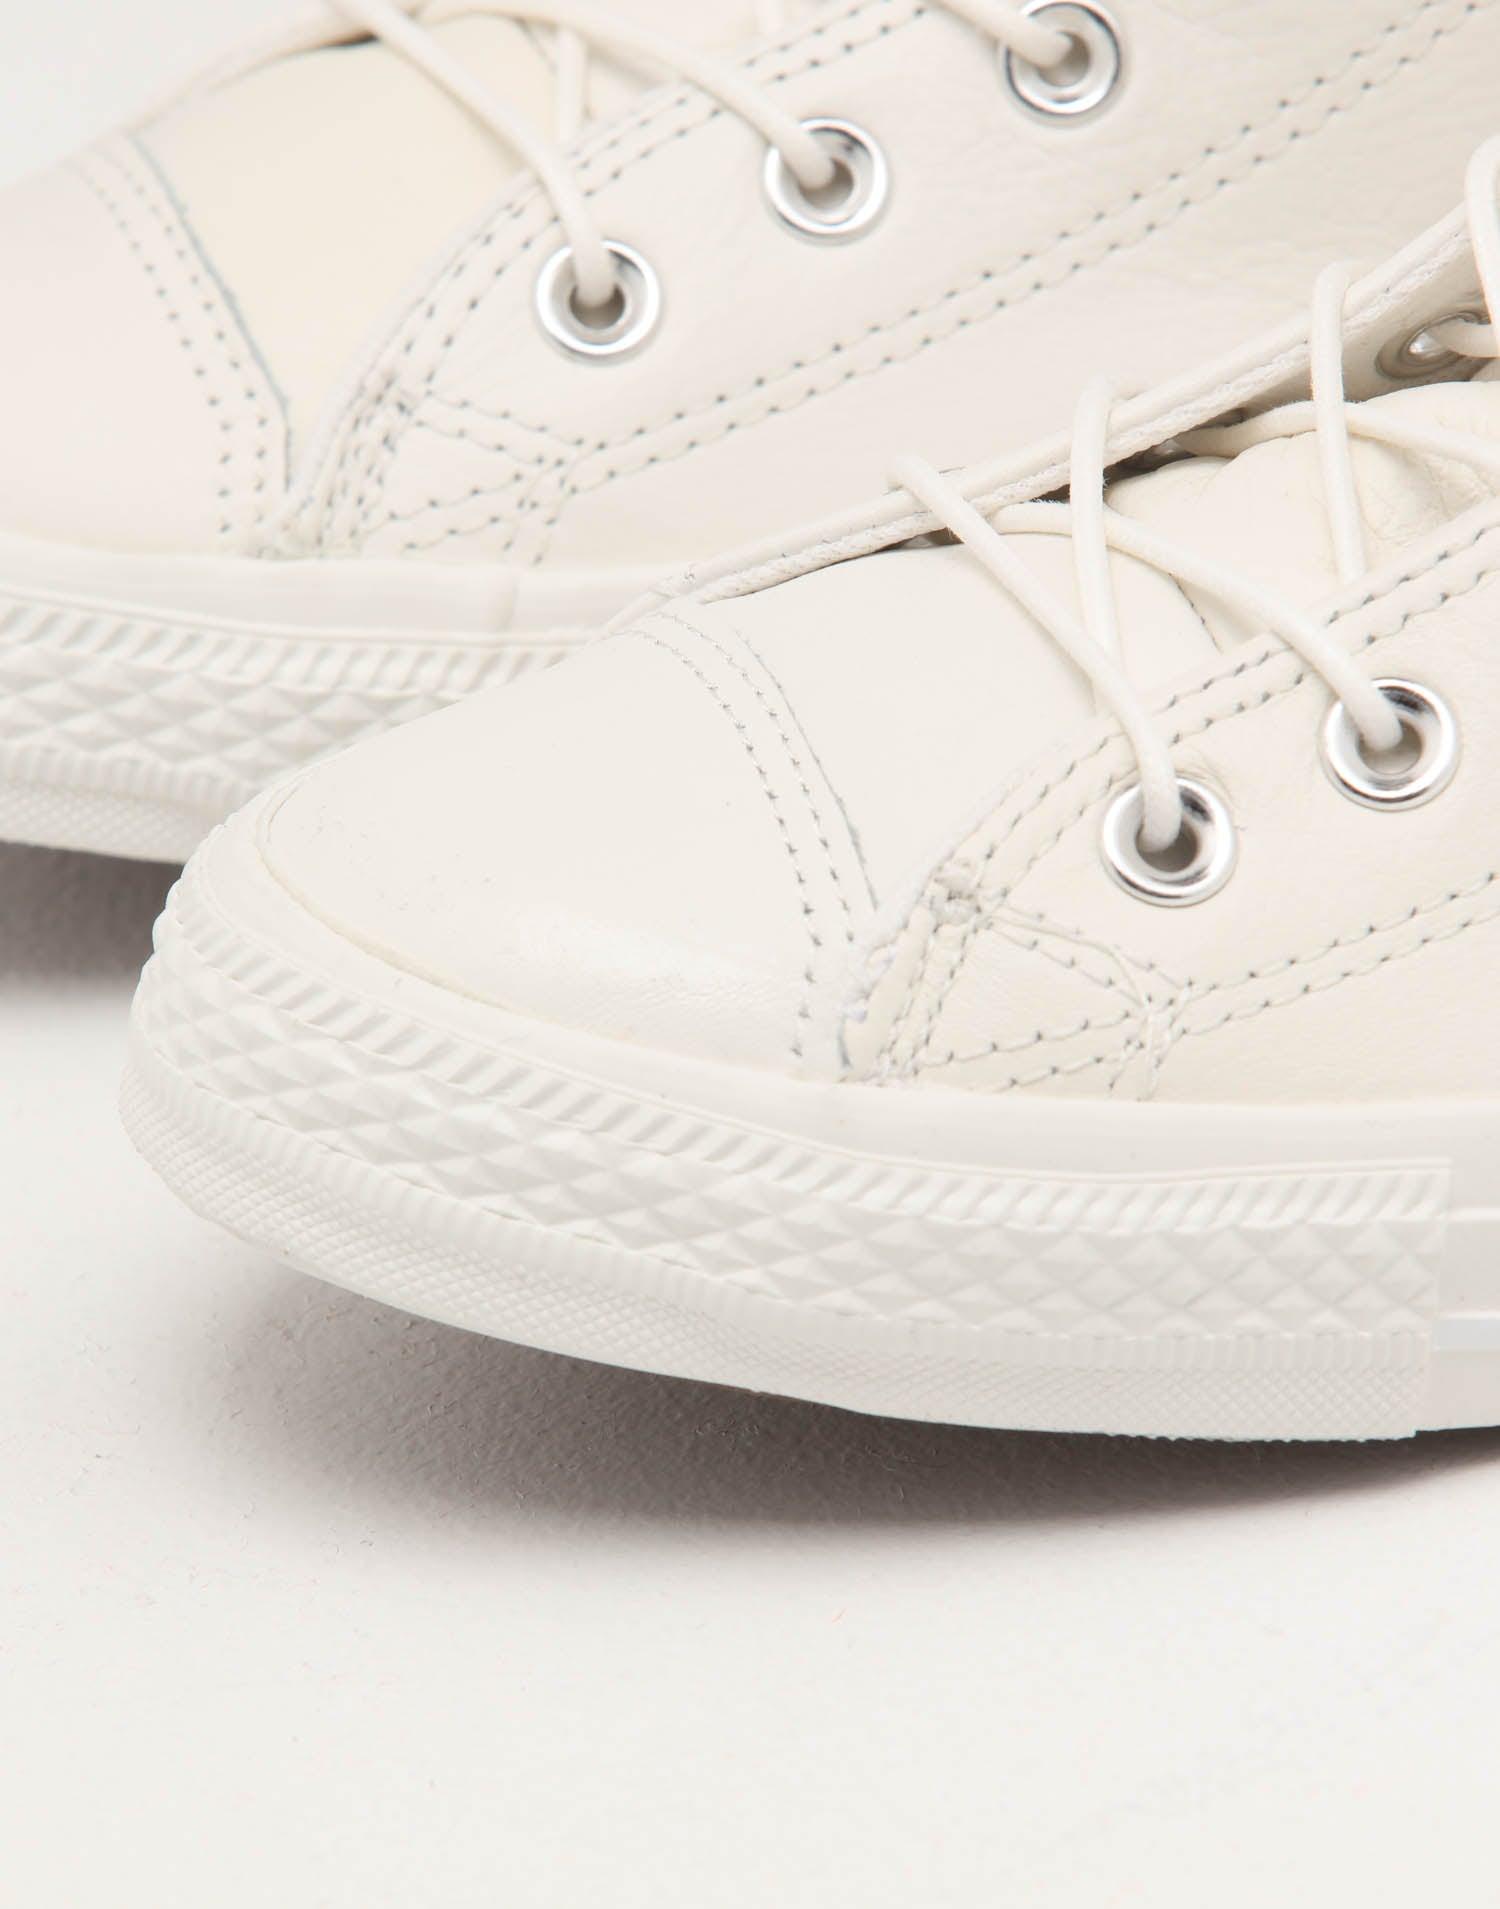 Converse Chuck Taylor Seasonal Leather Hi Vintage White